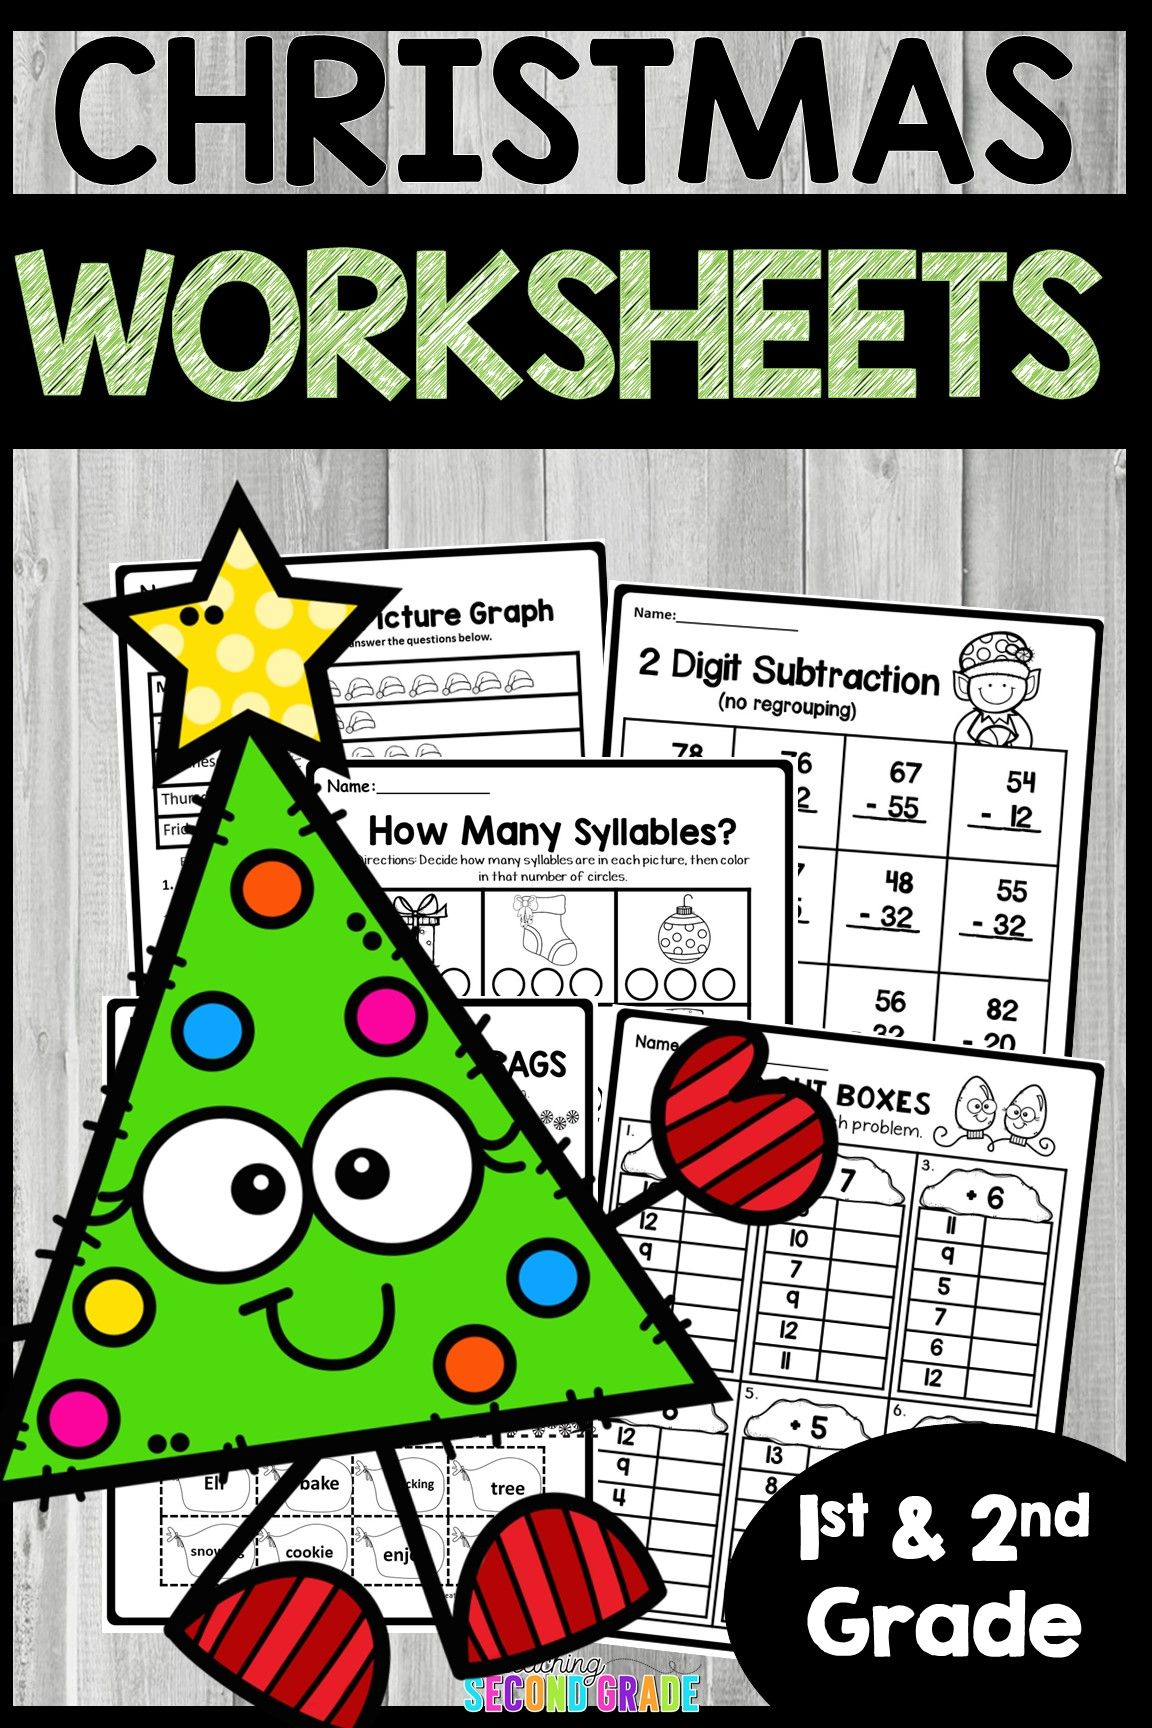 Christmas Worksheets   Christmas worksheets [ 1728 x 1152 Pixel ]